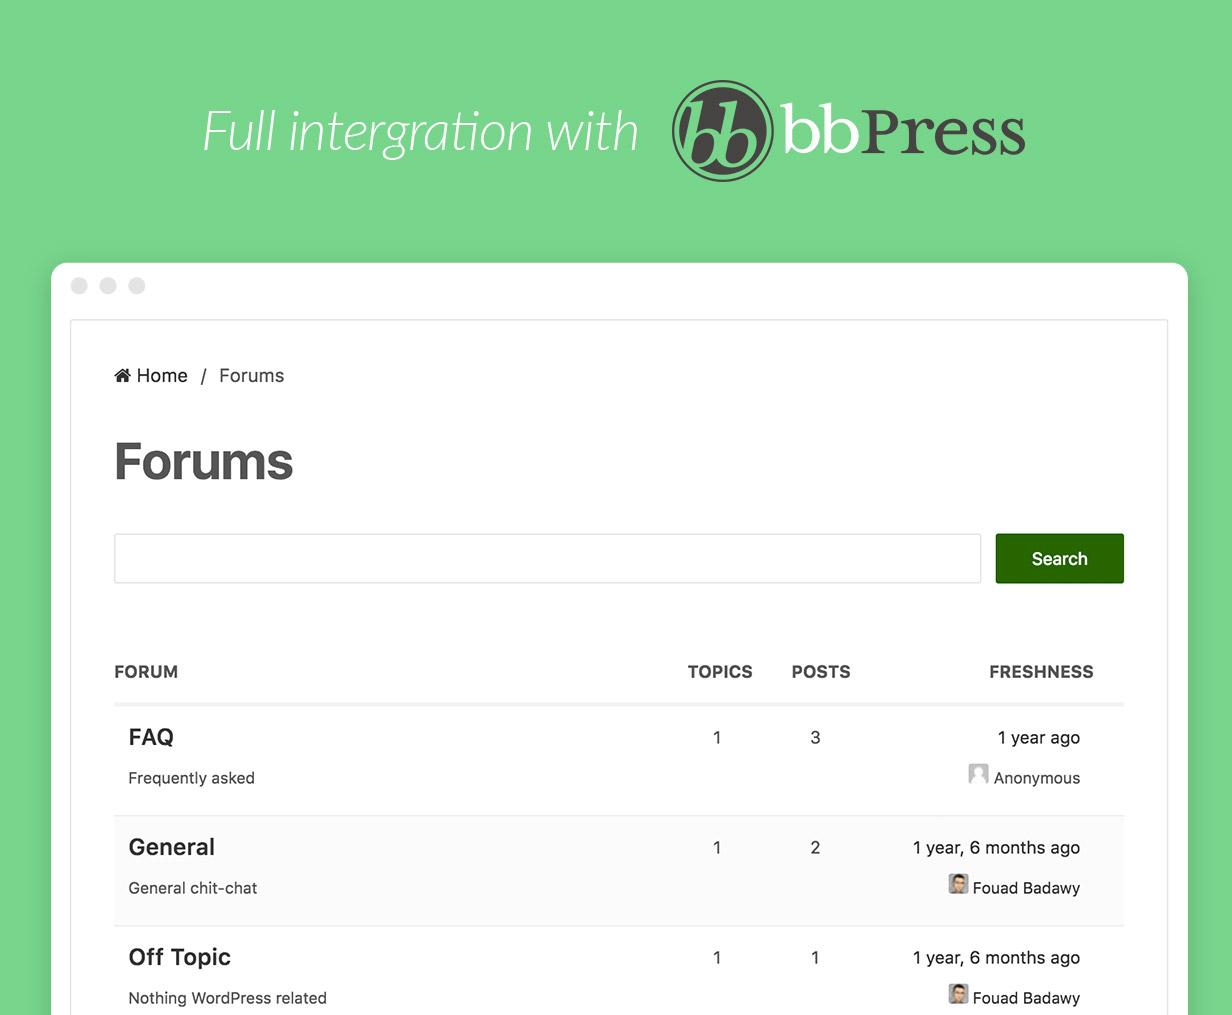 bbpress - Jannah - Newspaper Magazine News BuddyPress AMP